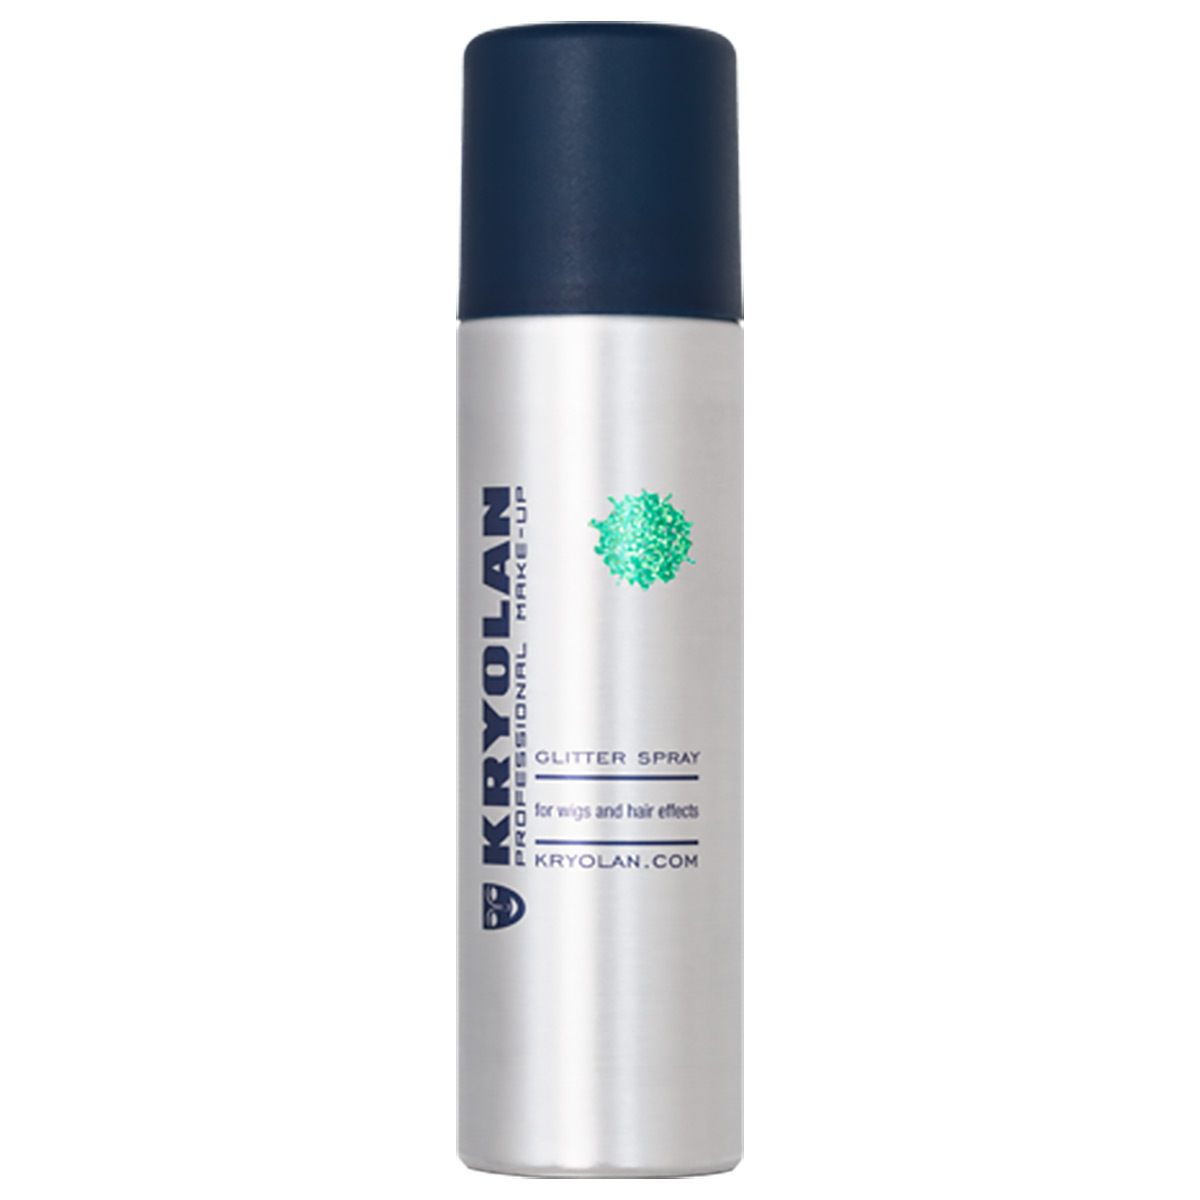 Glitter spray, grön